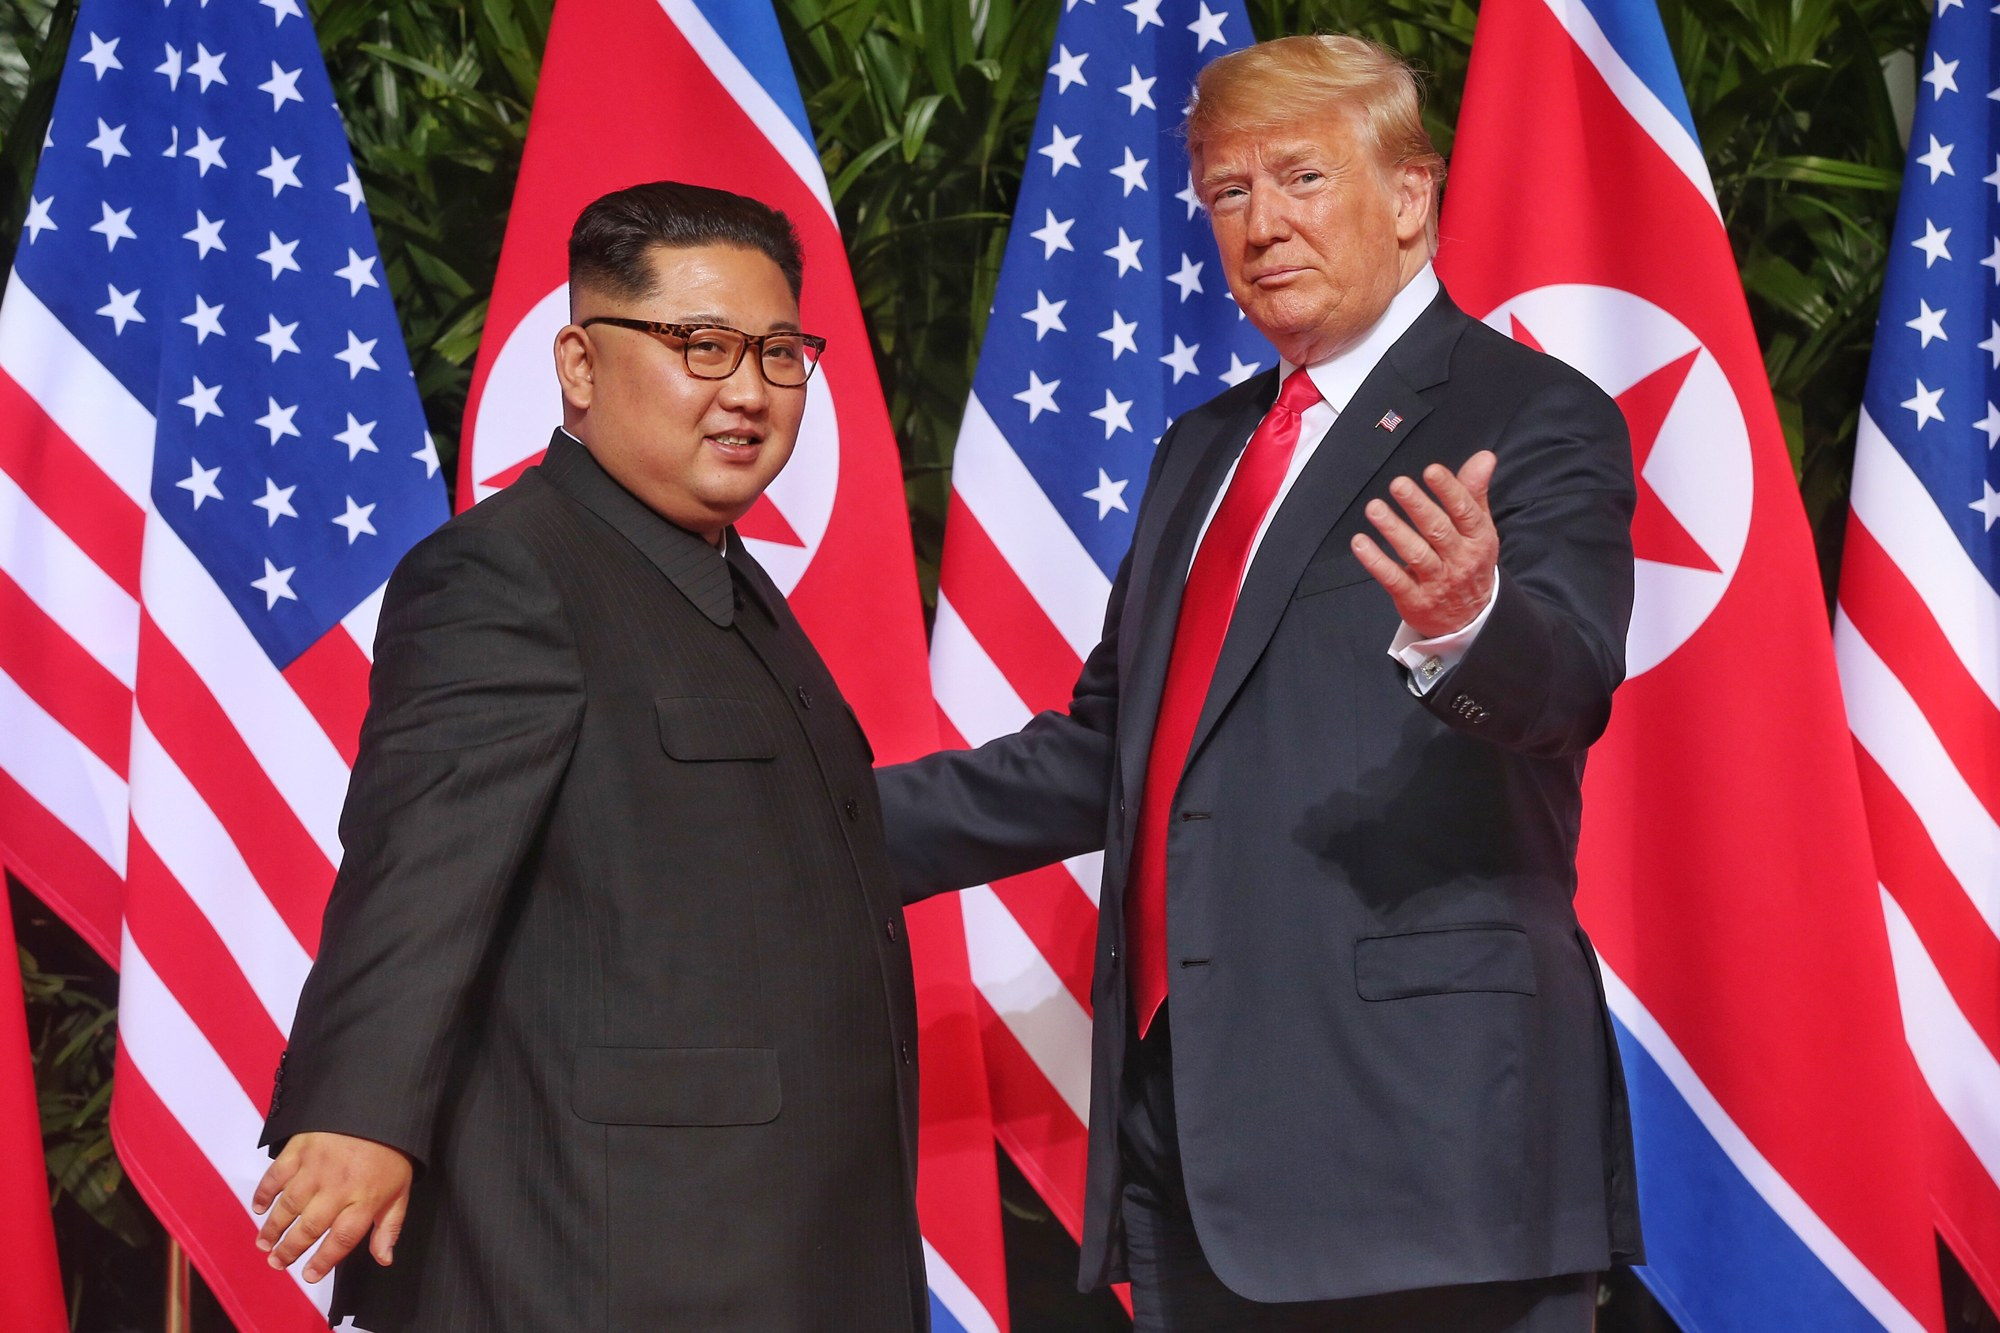 President Trump and Supreme Leader of North Korea Kim Jong-un at last month's Hanoi Summit ( Image )